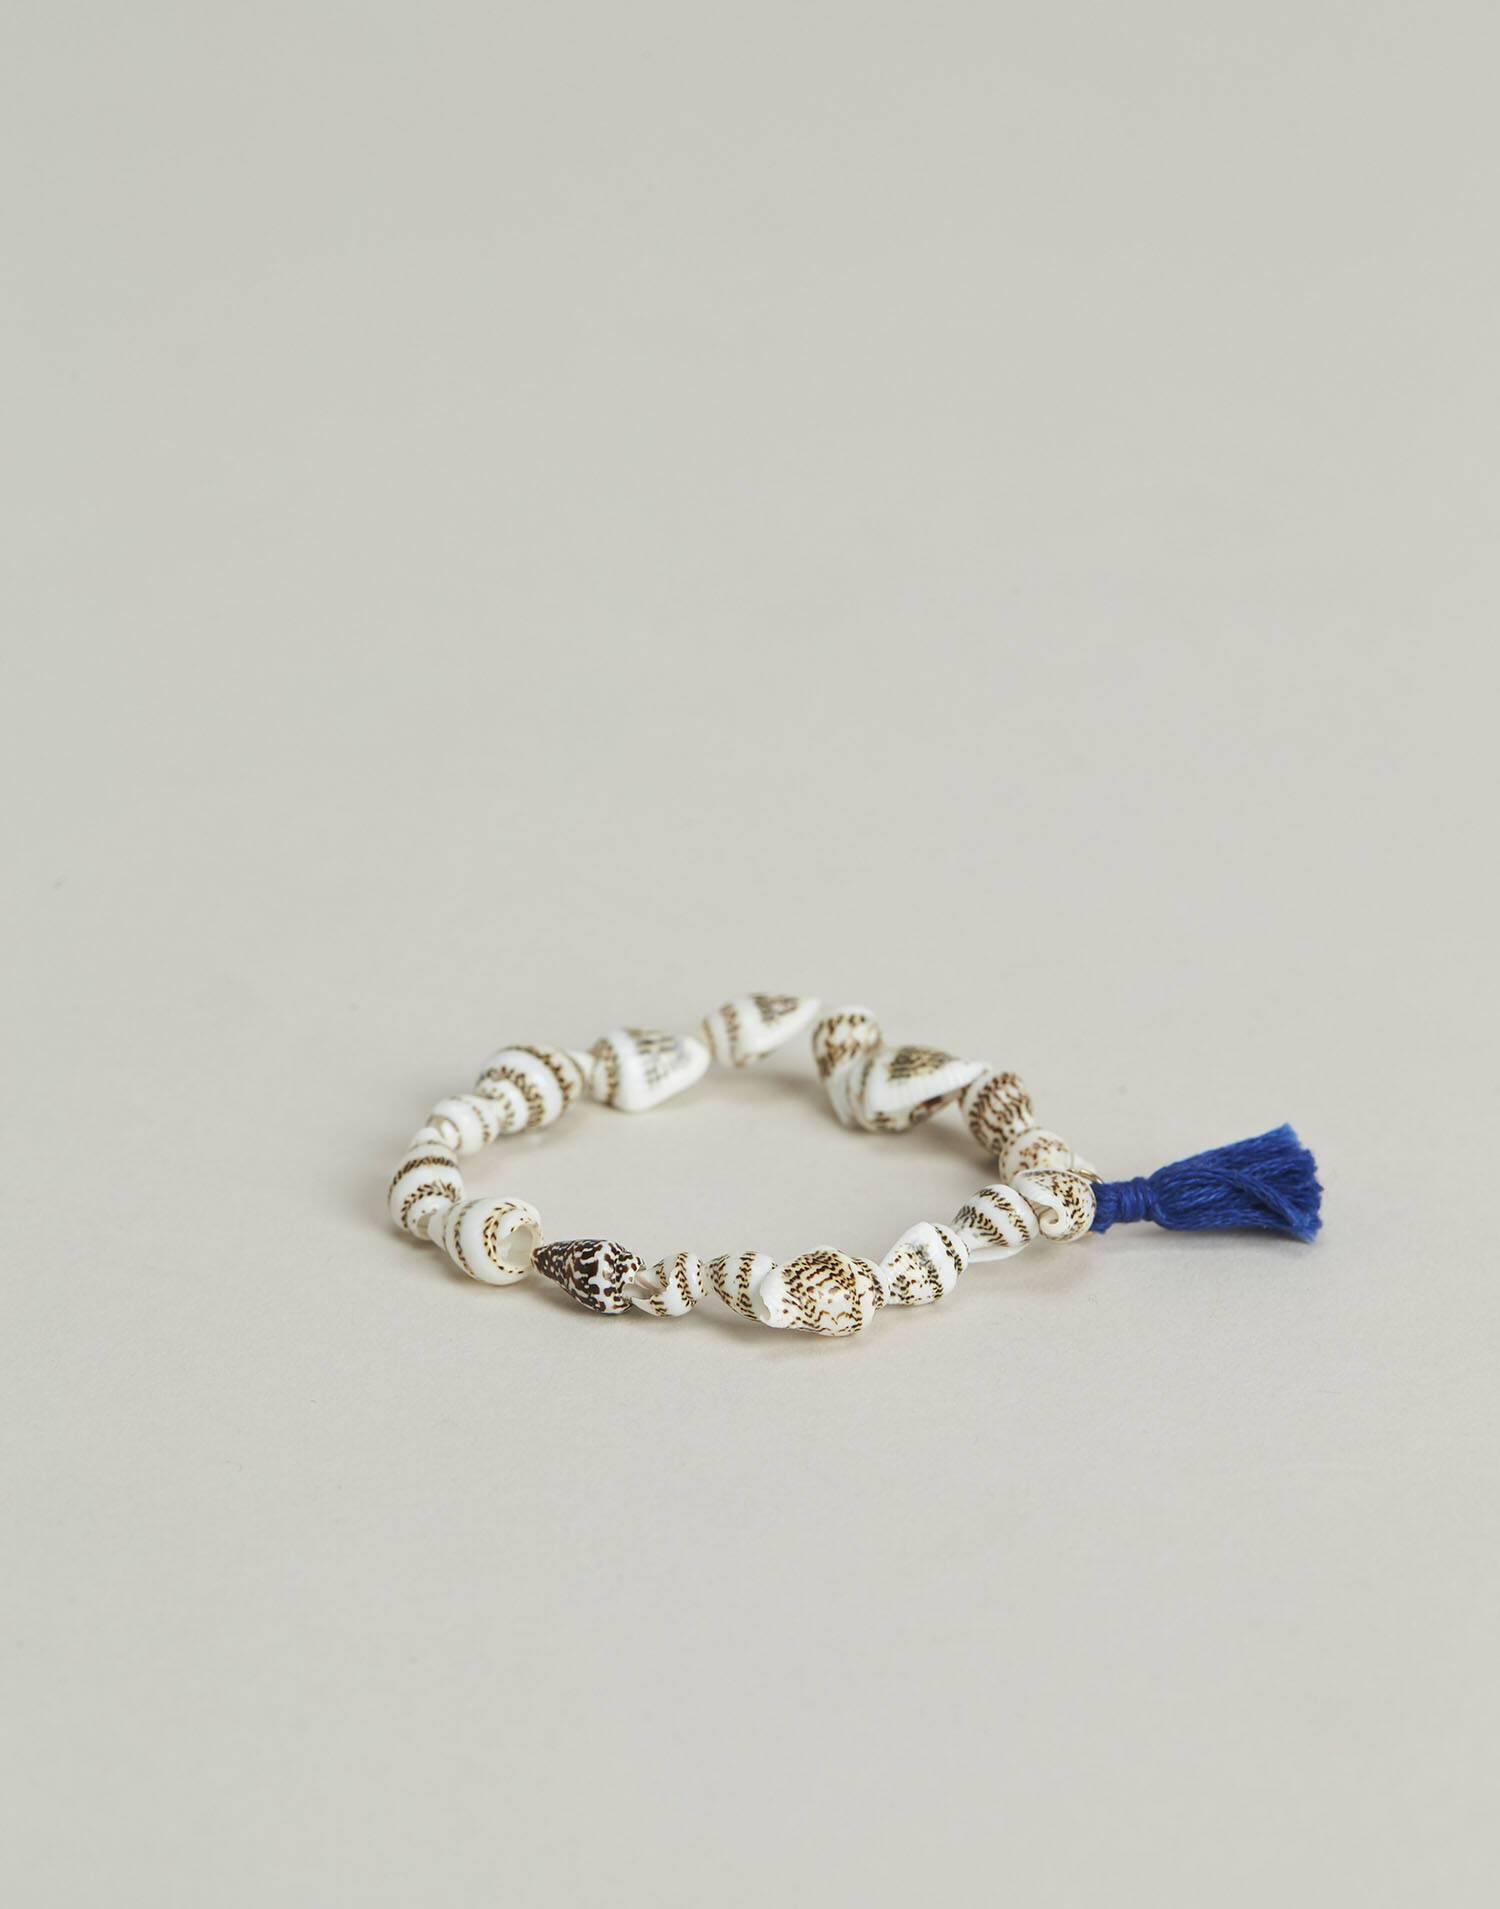 Shell anklet bracelet with pompom